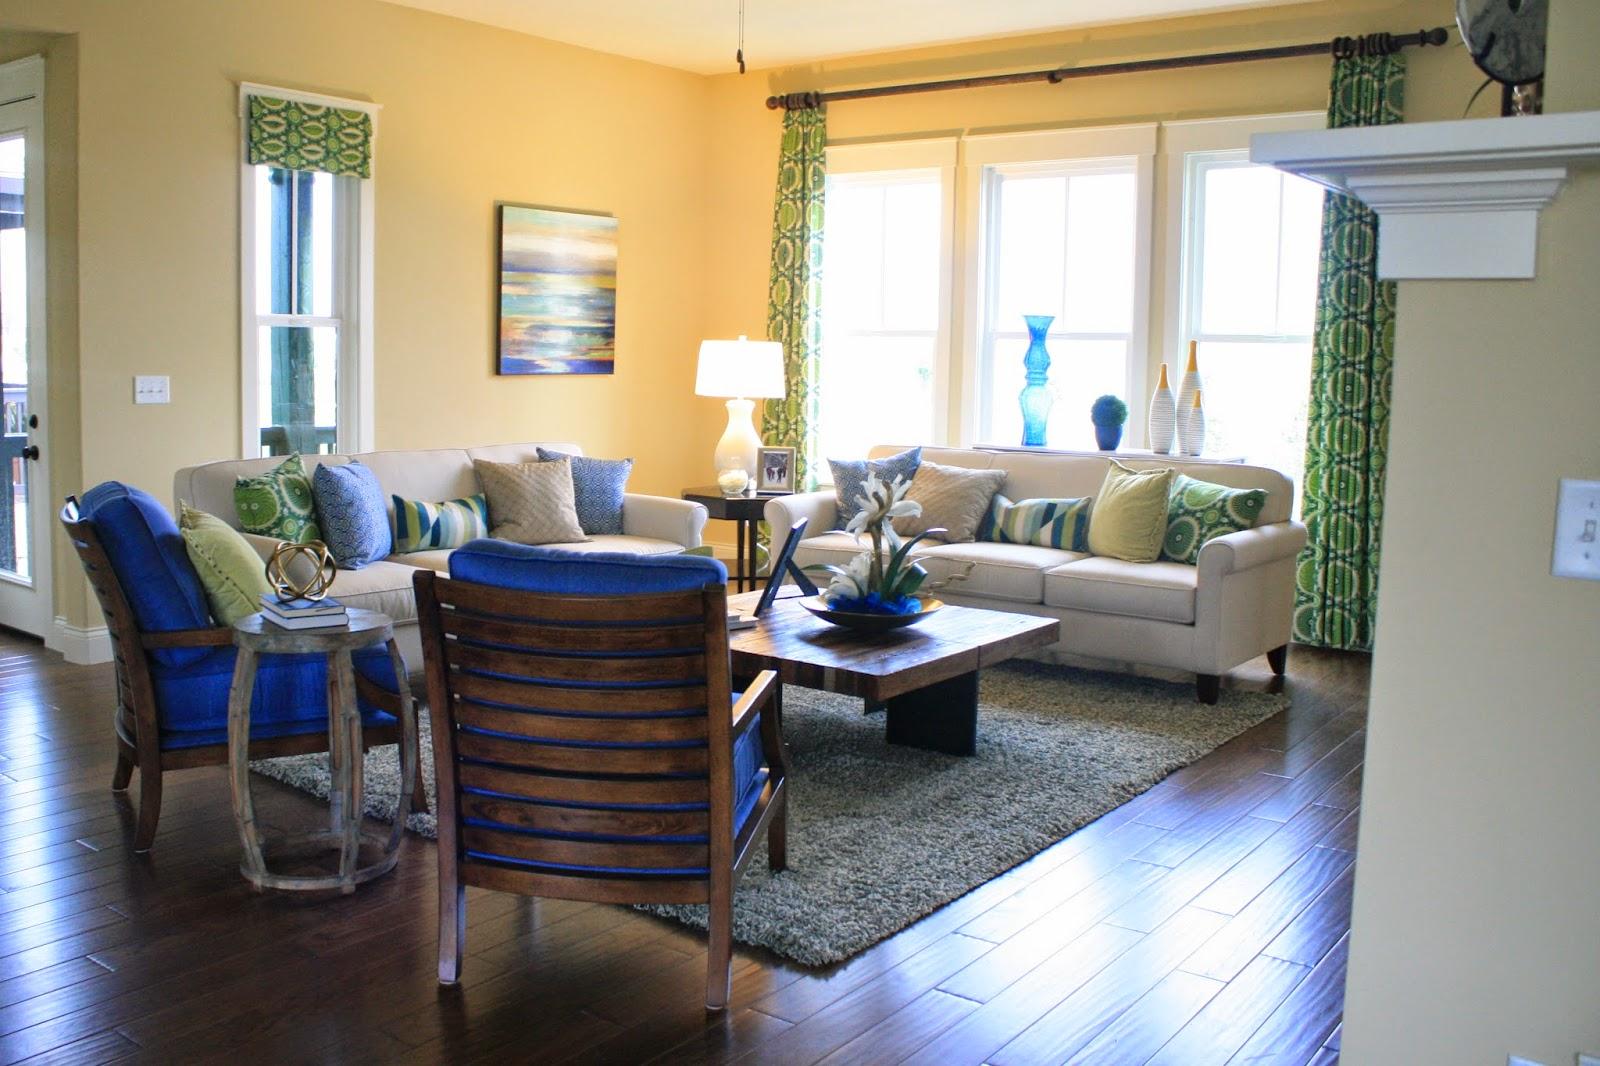 Http En Decoclub Net General Decoration Choosing A Floorplan For My Virtual Dream House